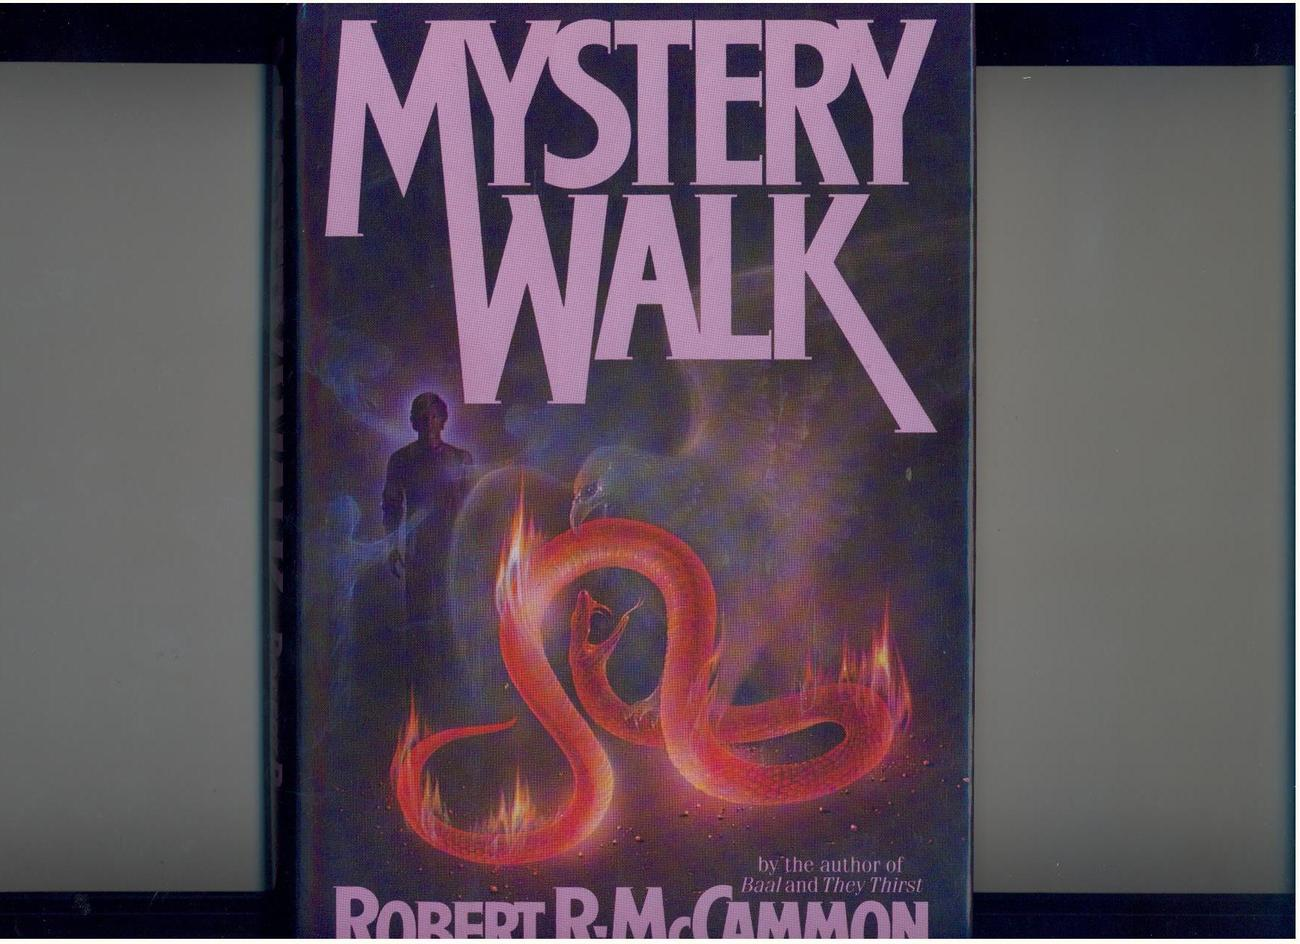 McCammon - MYSTERY WALK - 1983 - 1st, hb/dj - horror